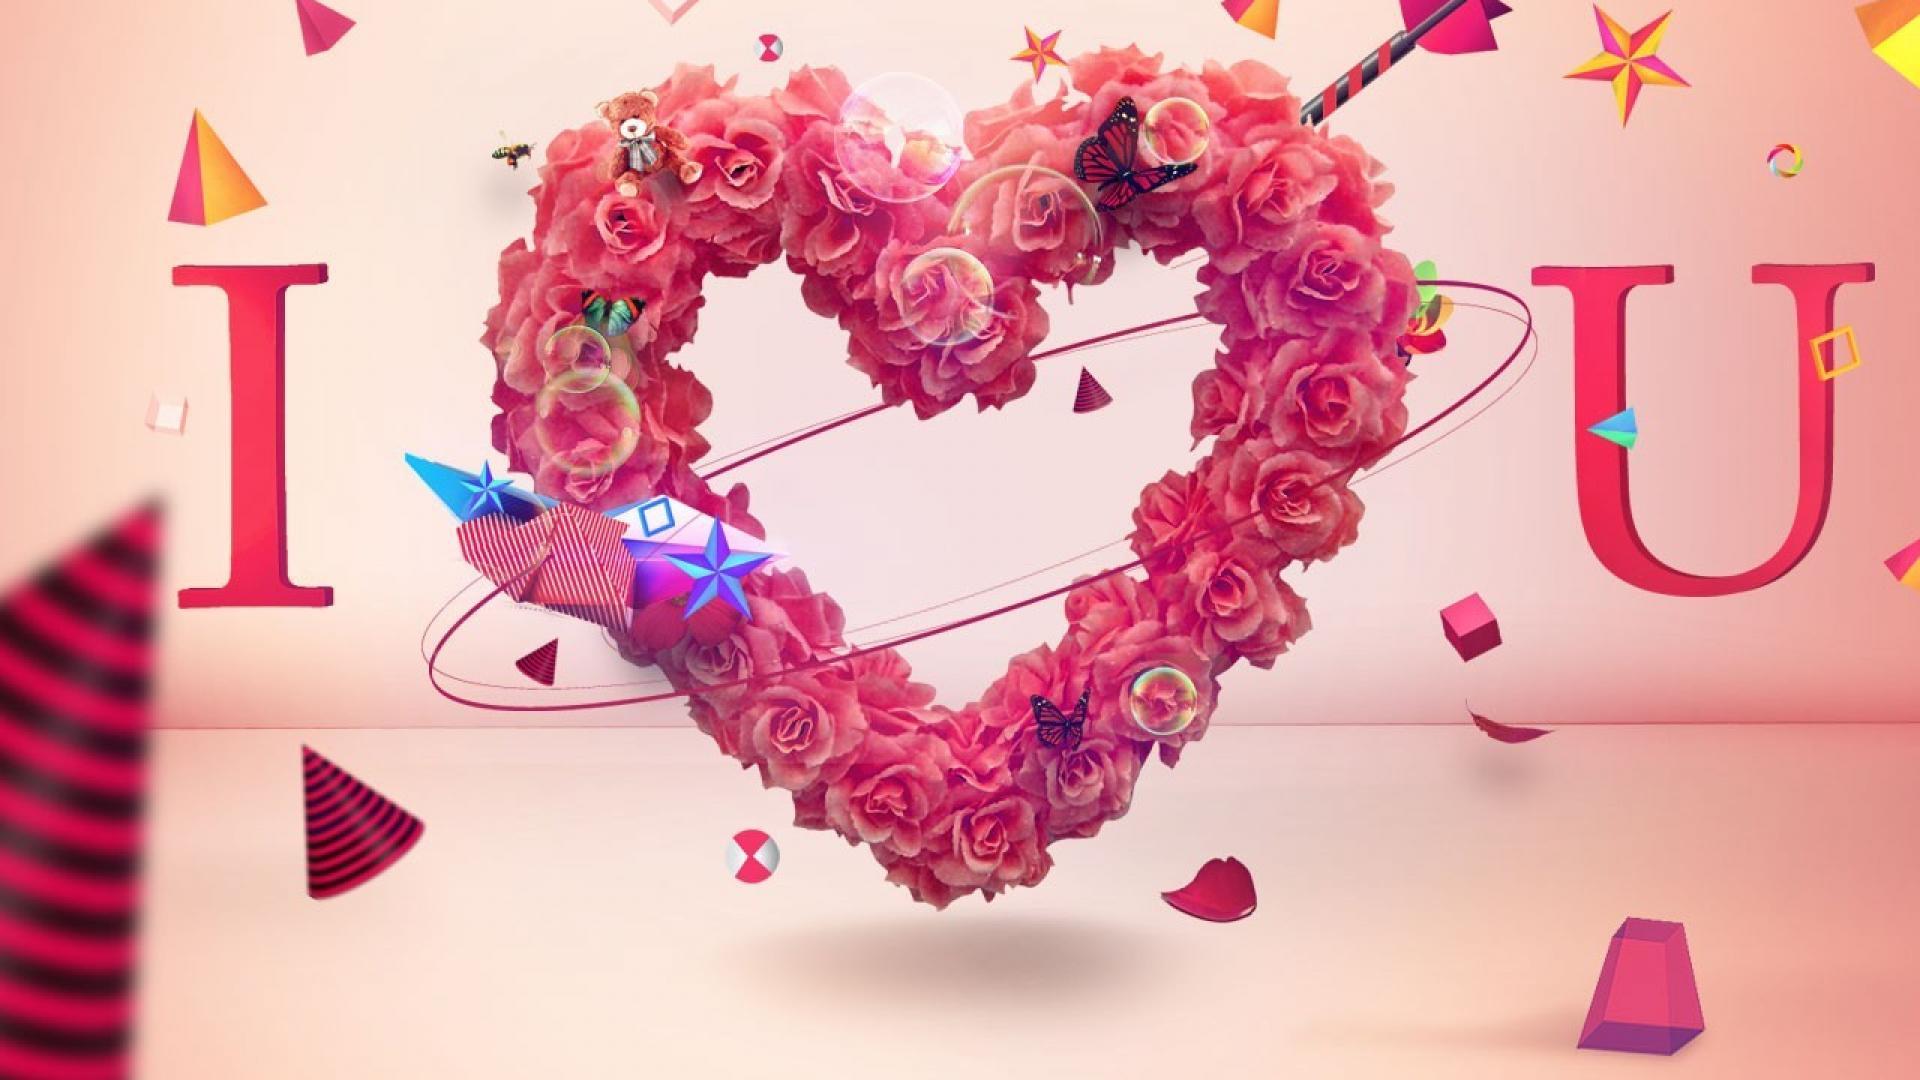 Love you wallpaper 31968 1920x1080